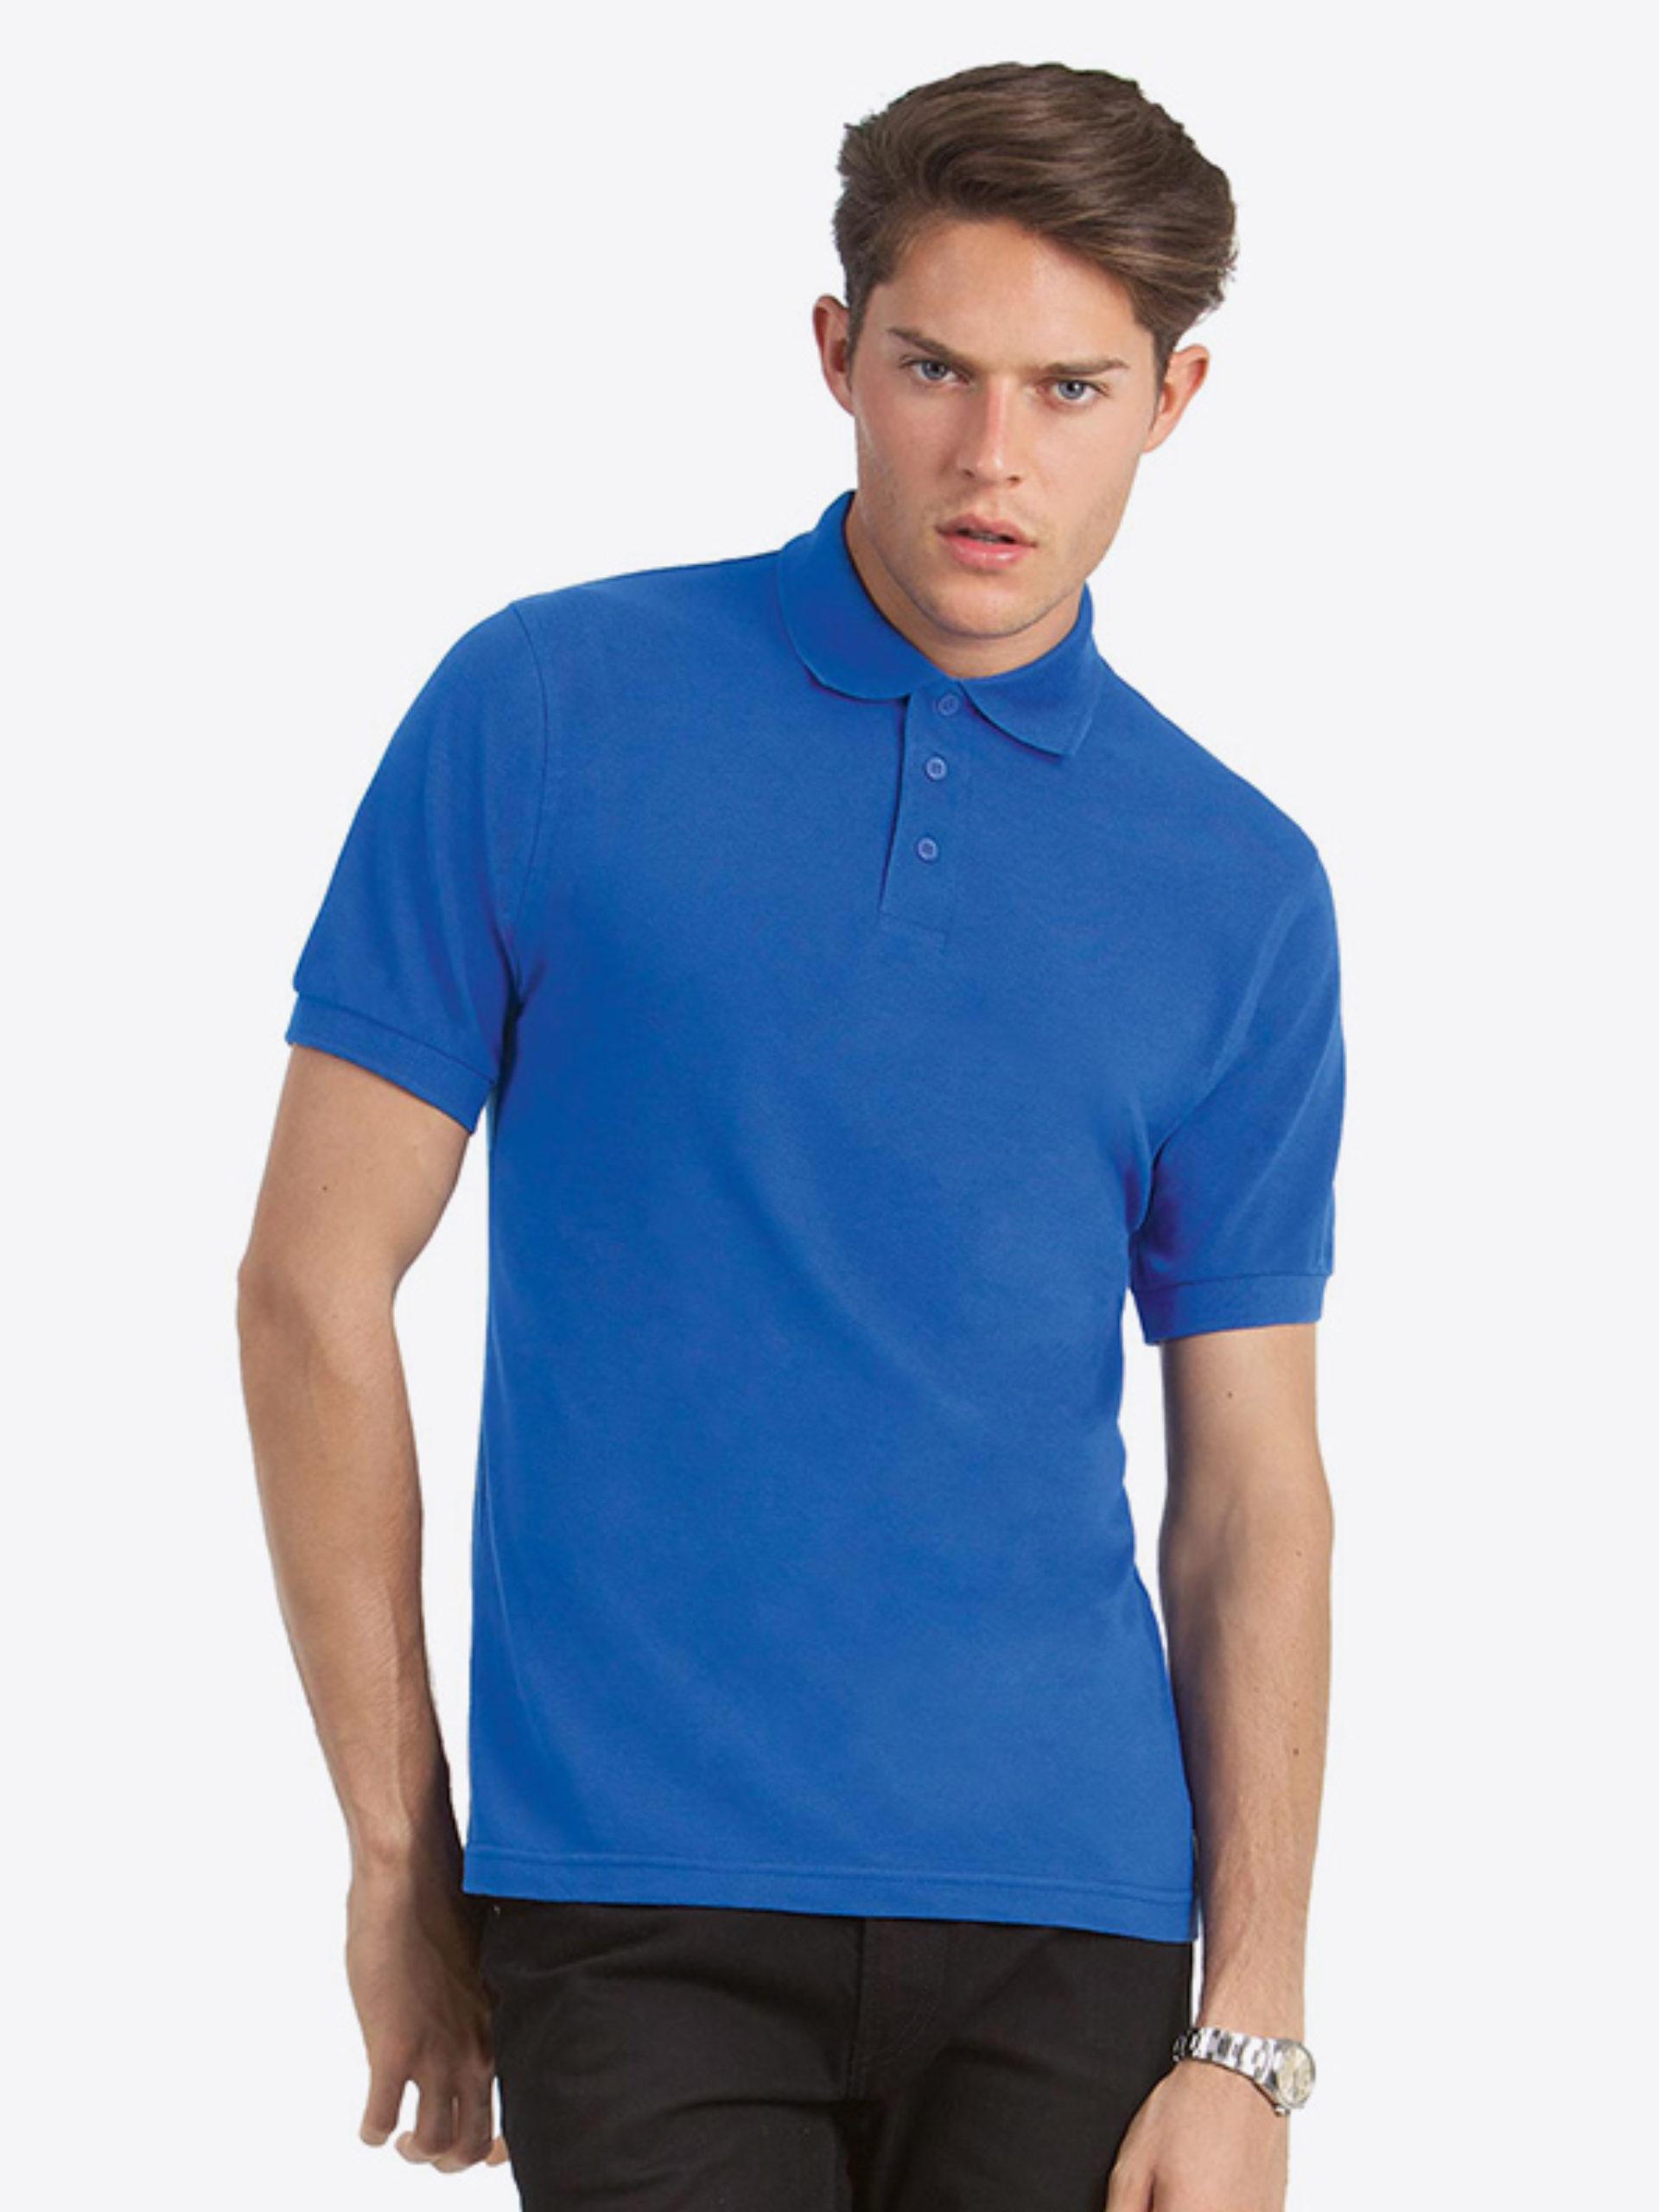 Herren Polo Shirt Bundc Safran Pu409